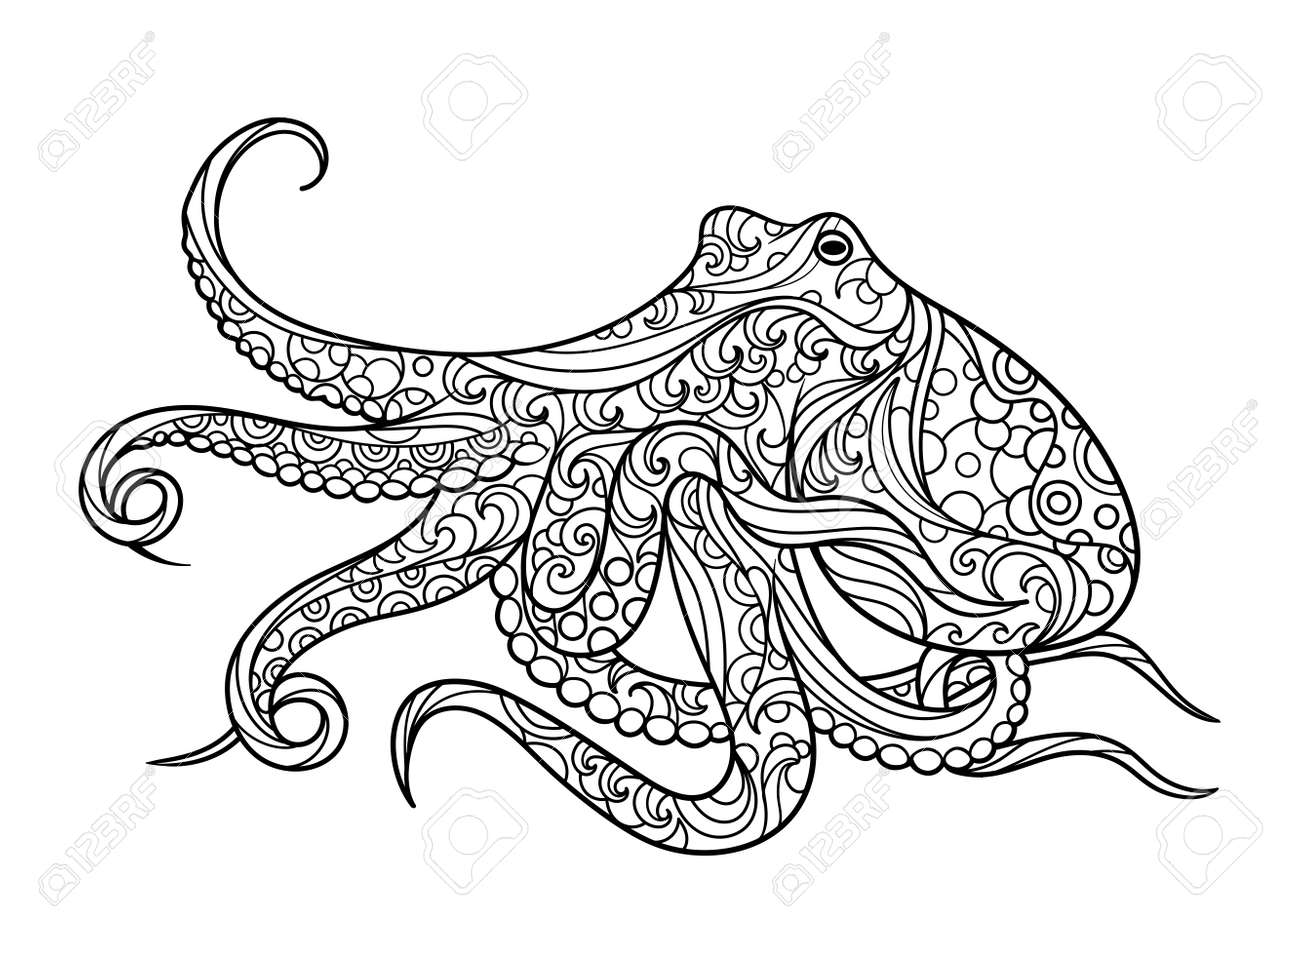 980+ Coloring Book Ocean Animal Picture HD